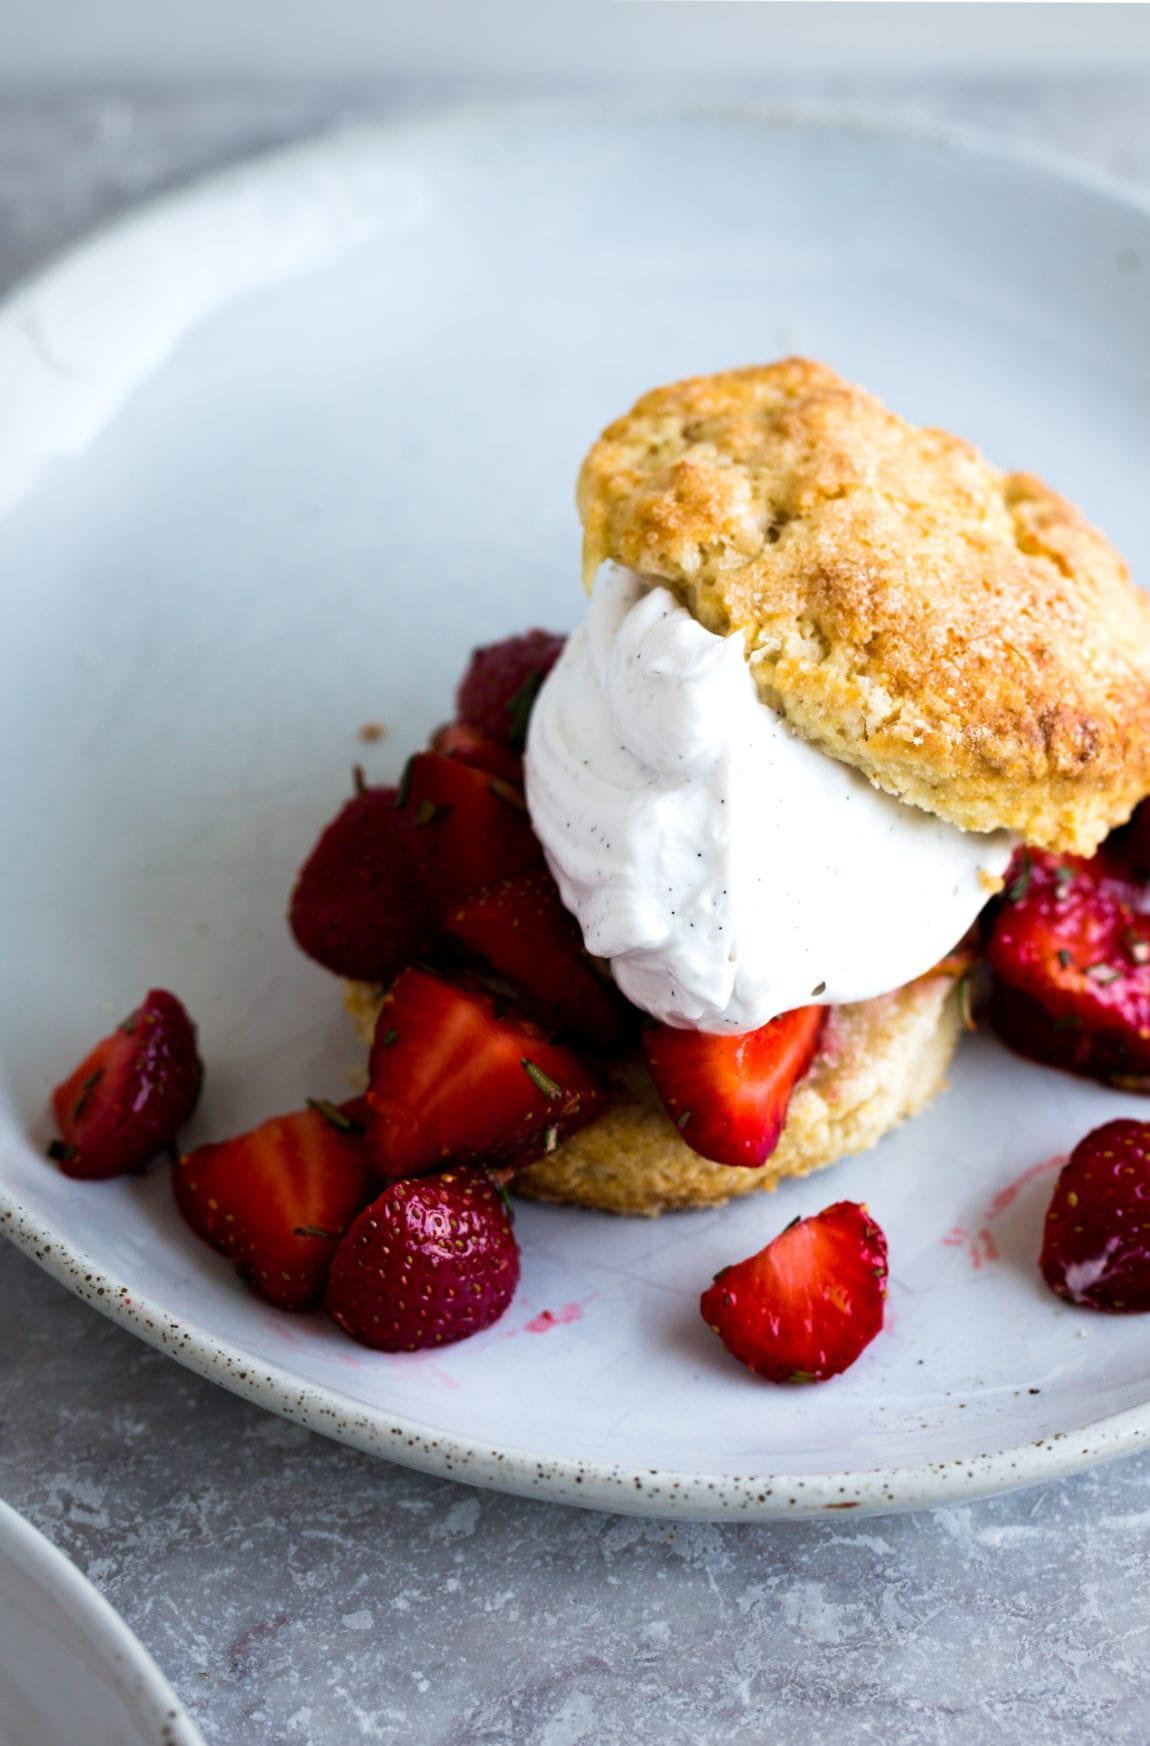 Barley & Rosemary Strawberry Shortcakes with Vanilla Bean Coconut Whipped Cream (vegan) | The Floured Kitchen